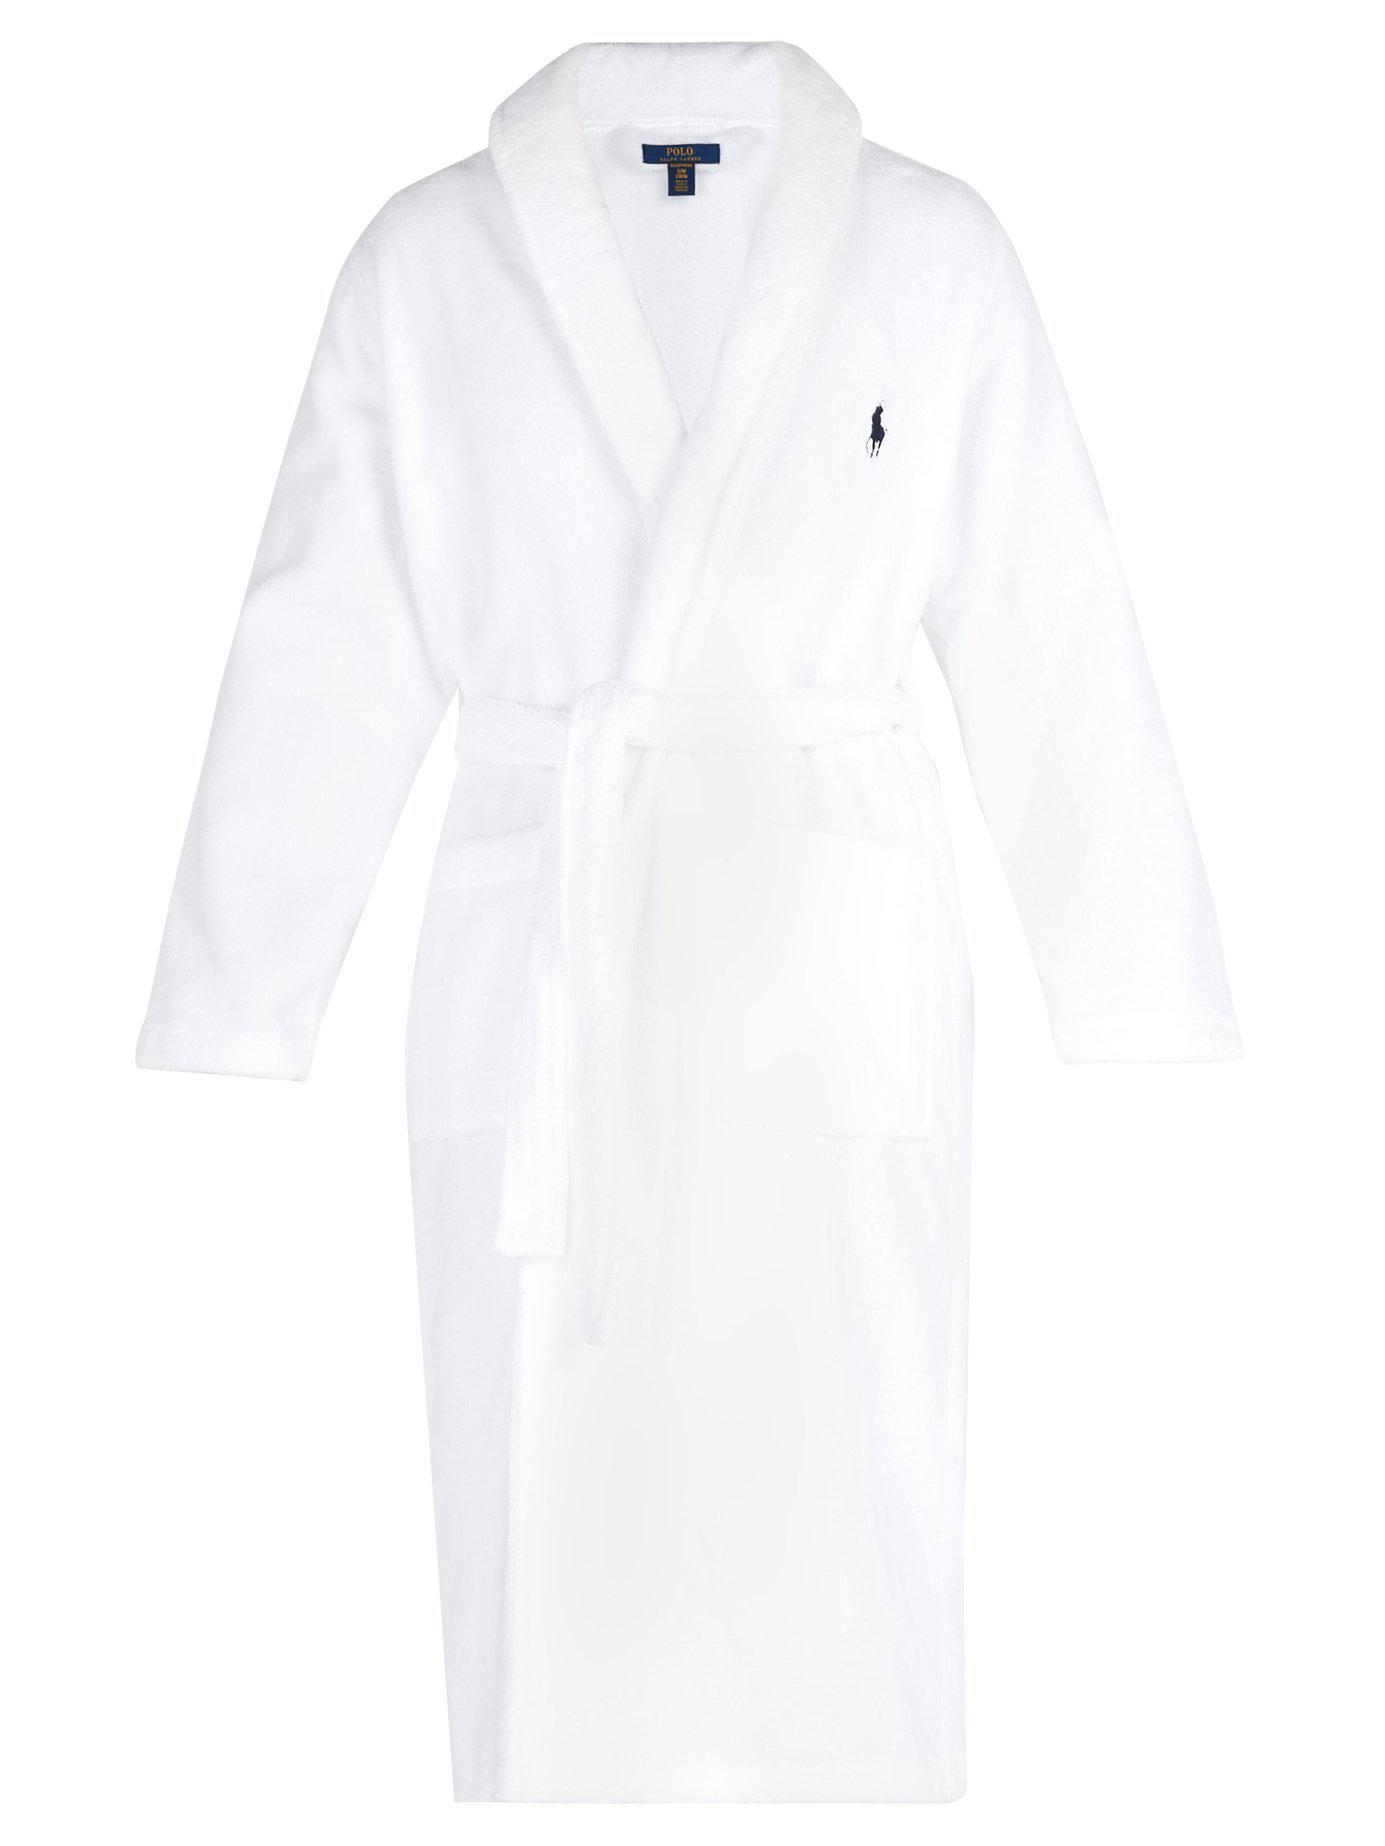 Polo Ralph Lauren. Men s White Logo Embroidered Terry Towelling Cotton  Bathrobe 1b9c918fe4c2